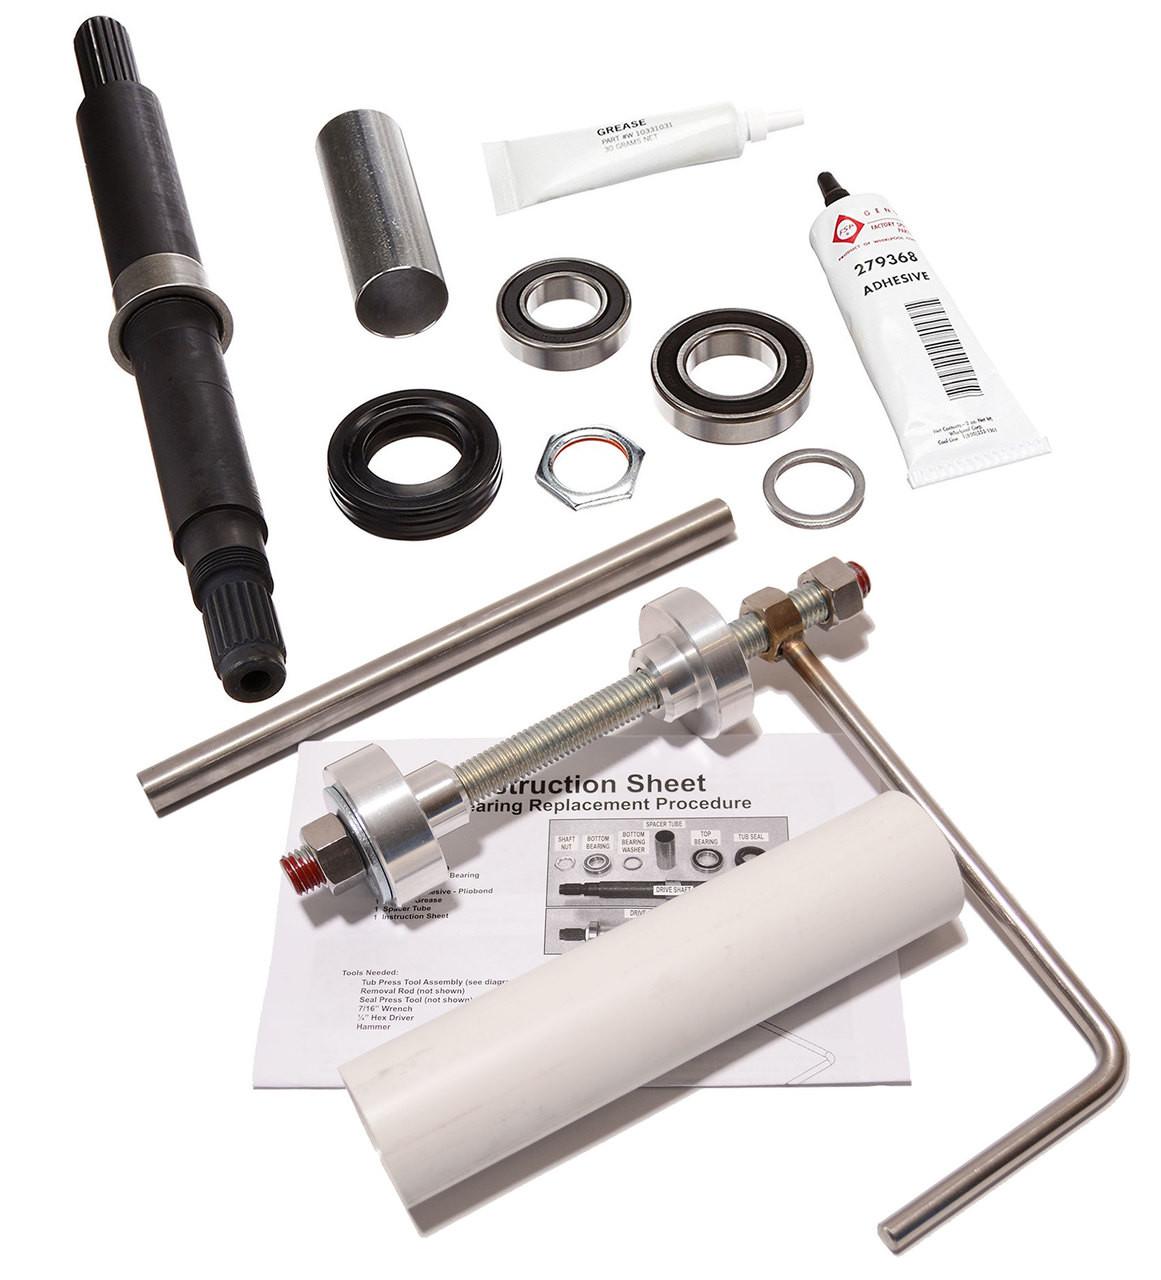 Part OEM Whirlpool W35-5655-1 Washer Hub Seal Nut Genuine Original Equipment Manufacturer